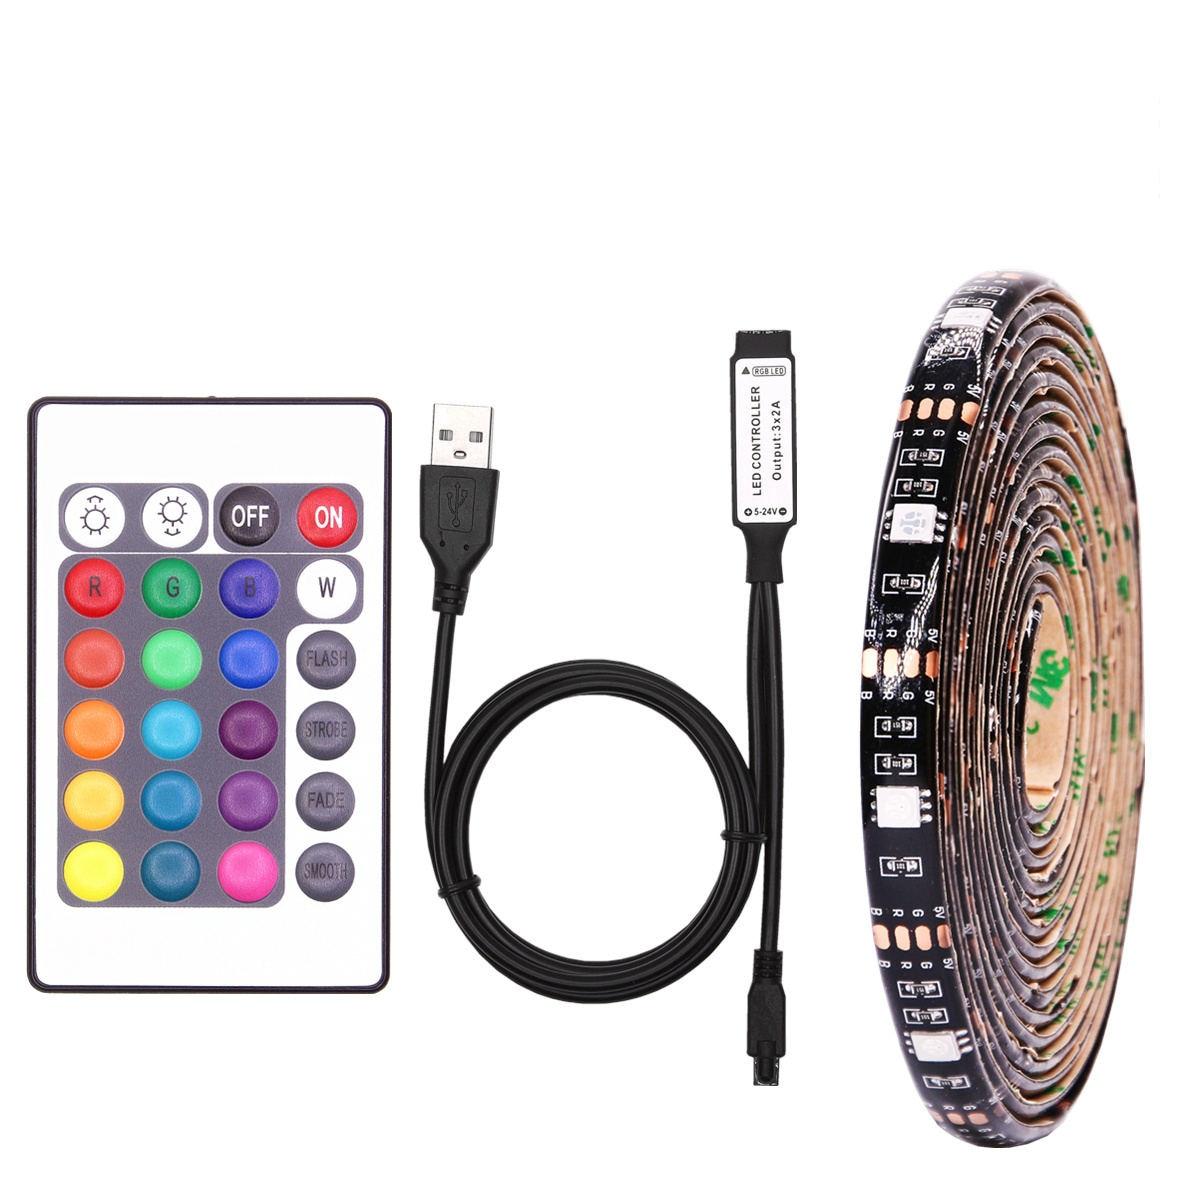 RGB LED Strip Waterproof SMD 5050 DC 5V USB LED neon Light Strip Flexible Bias Lighting Backlight with Remote For TV Background